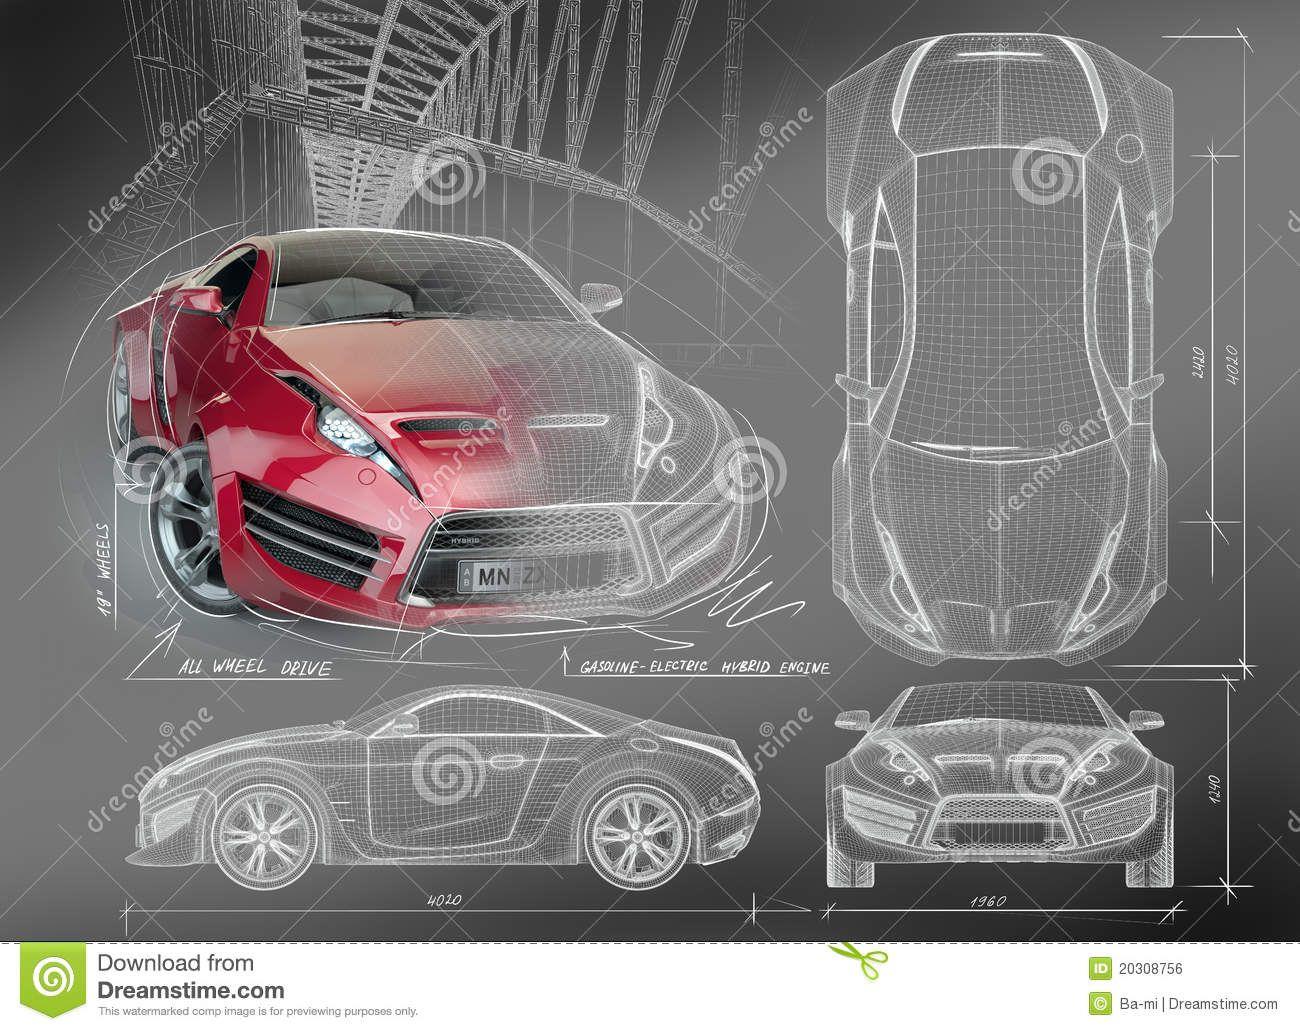 Graphic design vehicle blueprint google search spec sheets graphic design vehicle blueprint google search malvernweather Gallery